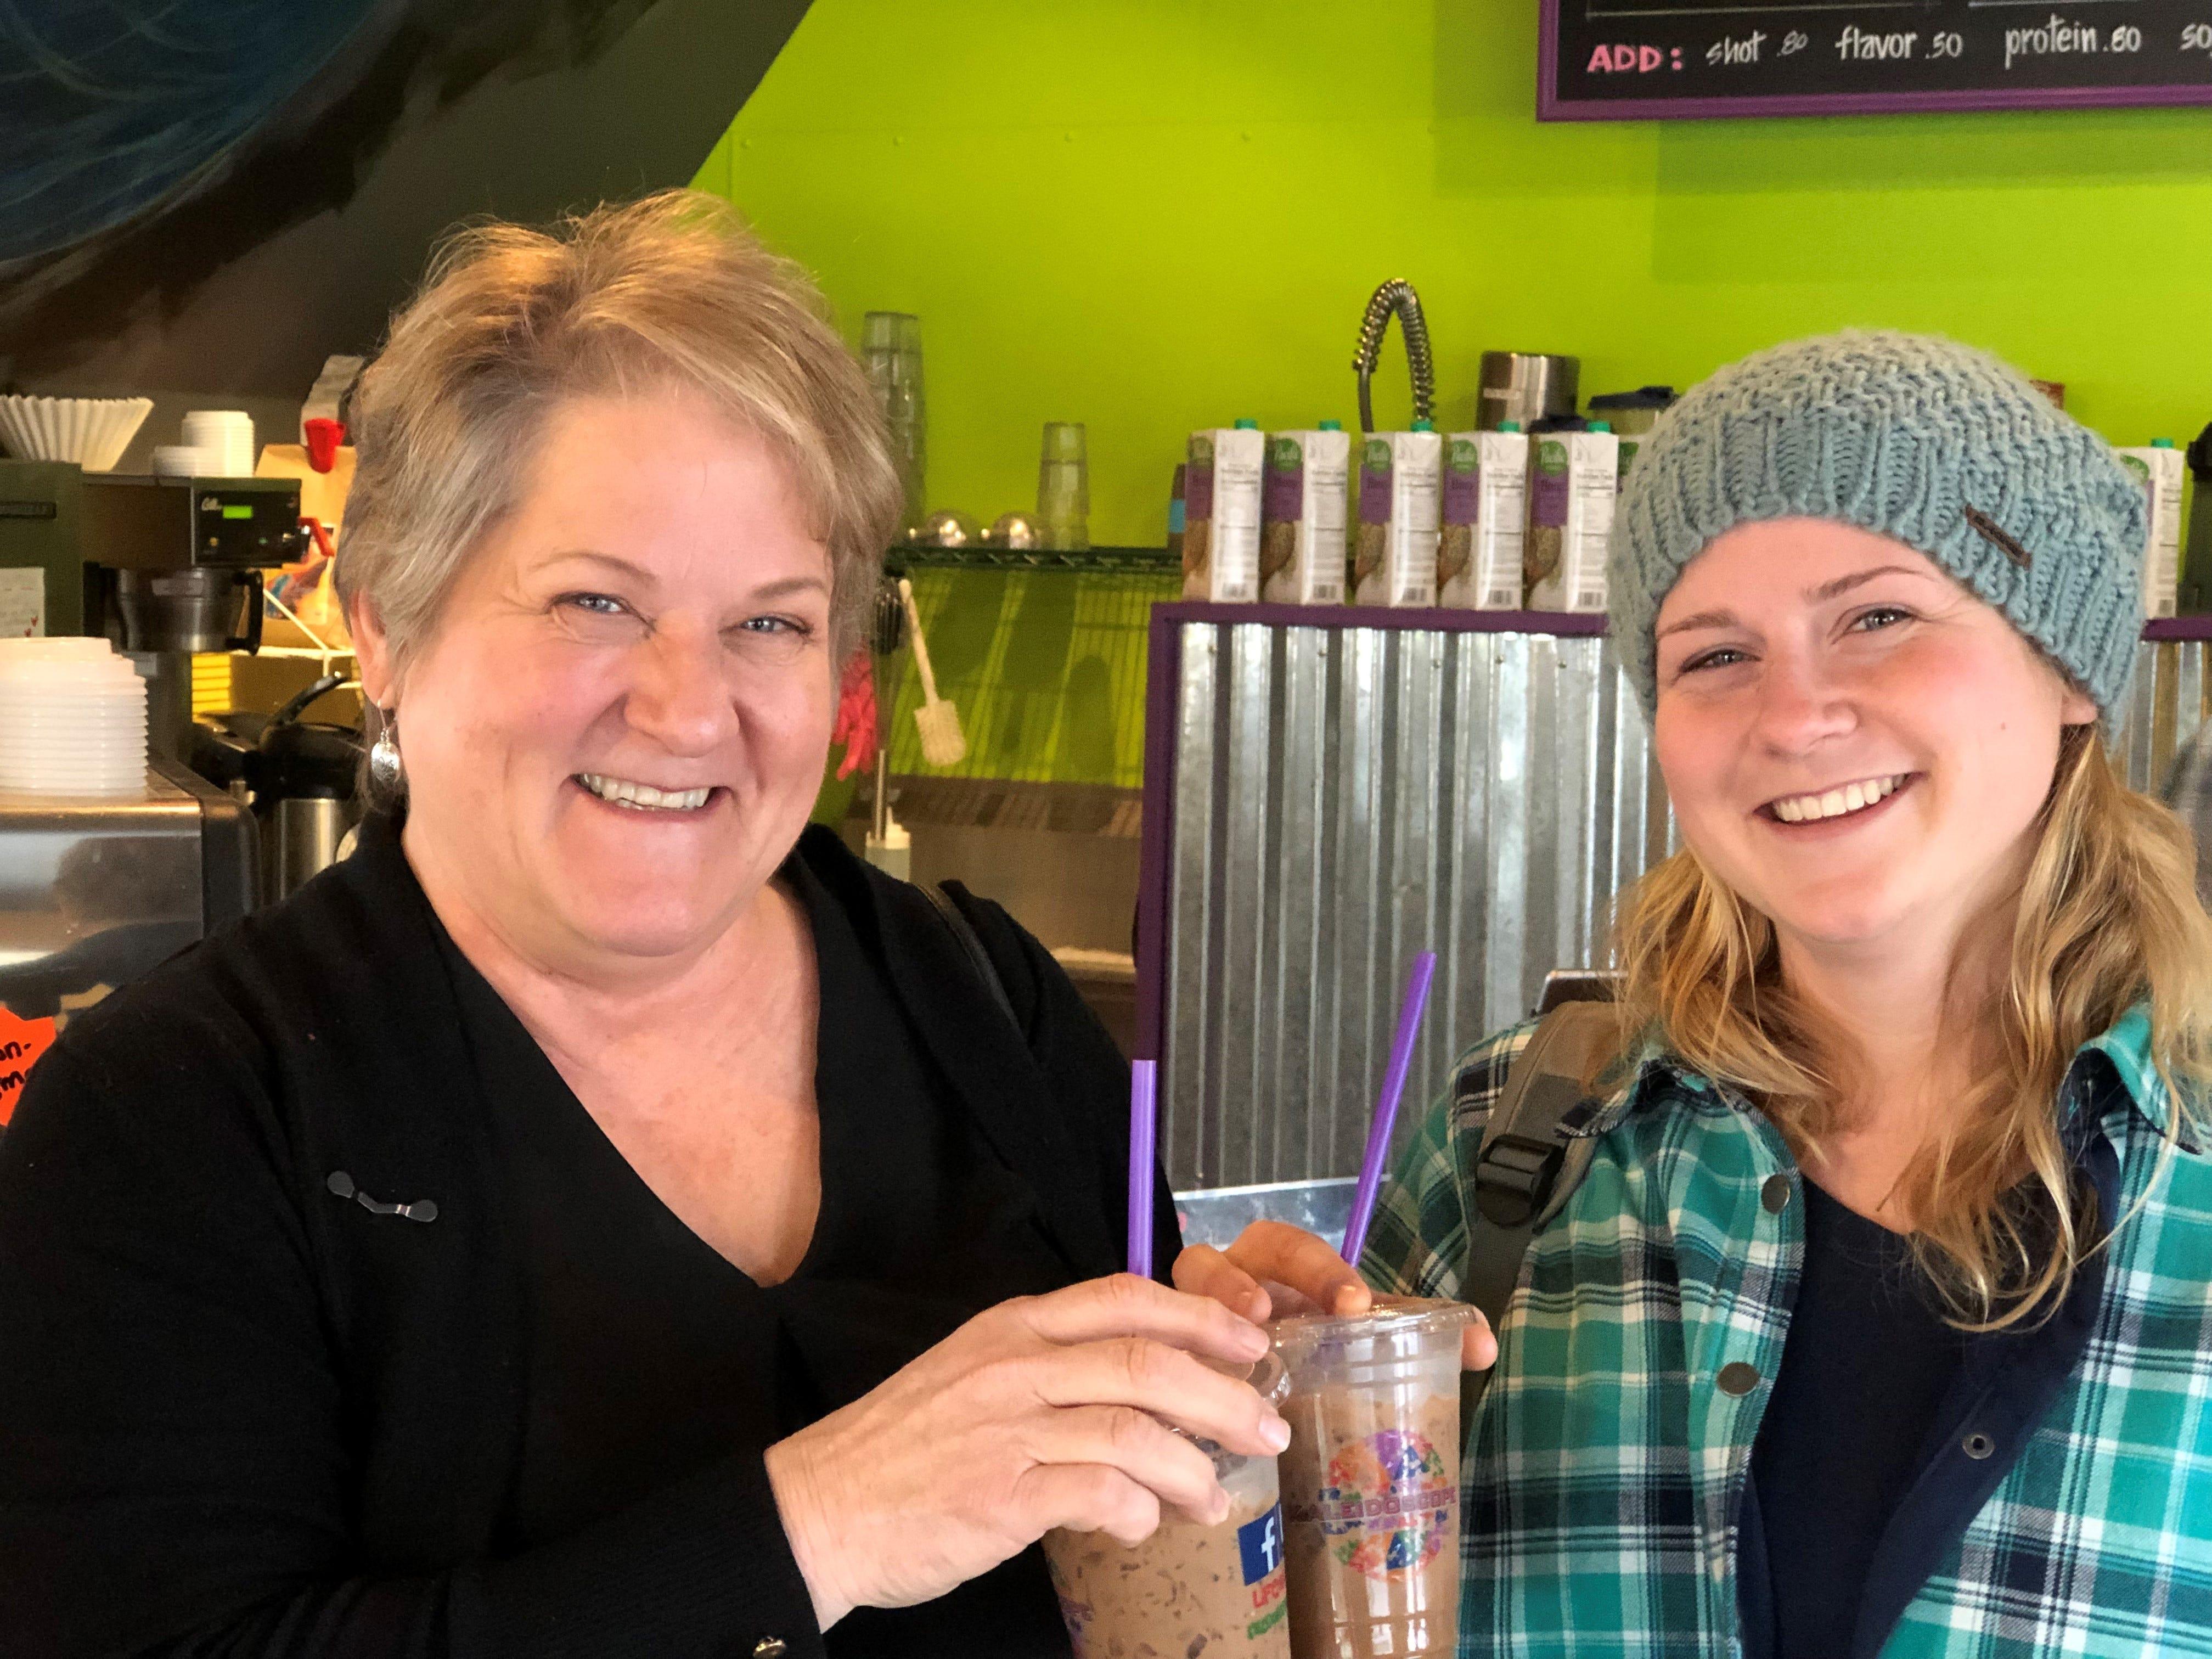 Linda Burbank and her daughter Ashley Christensen are regulars at Kaleidoscope Coffee.